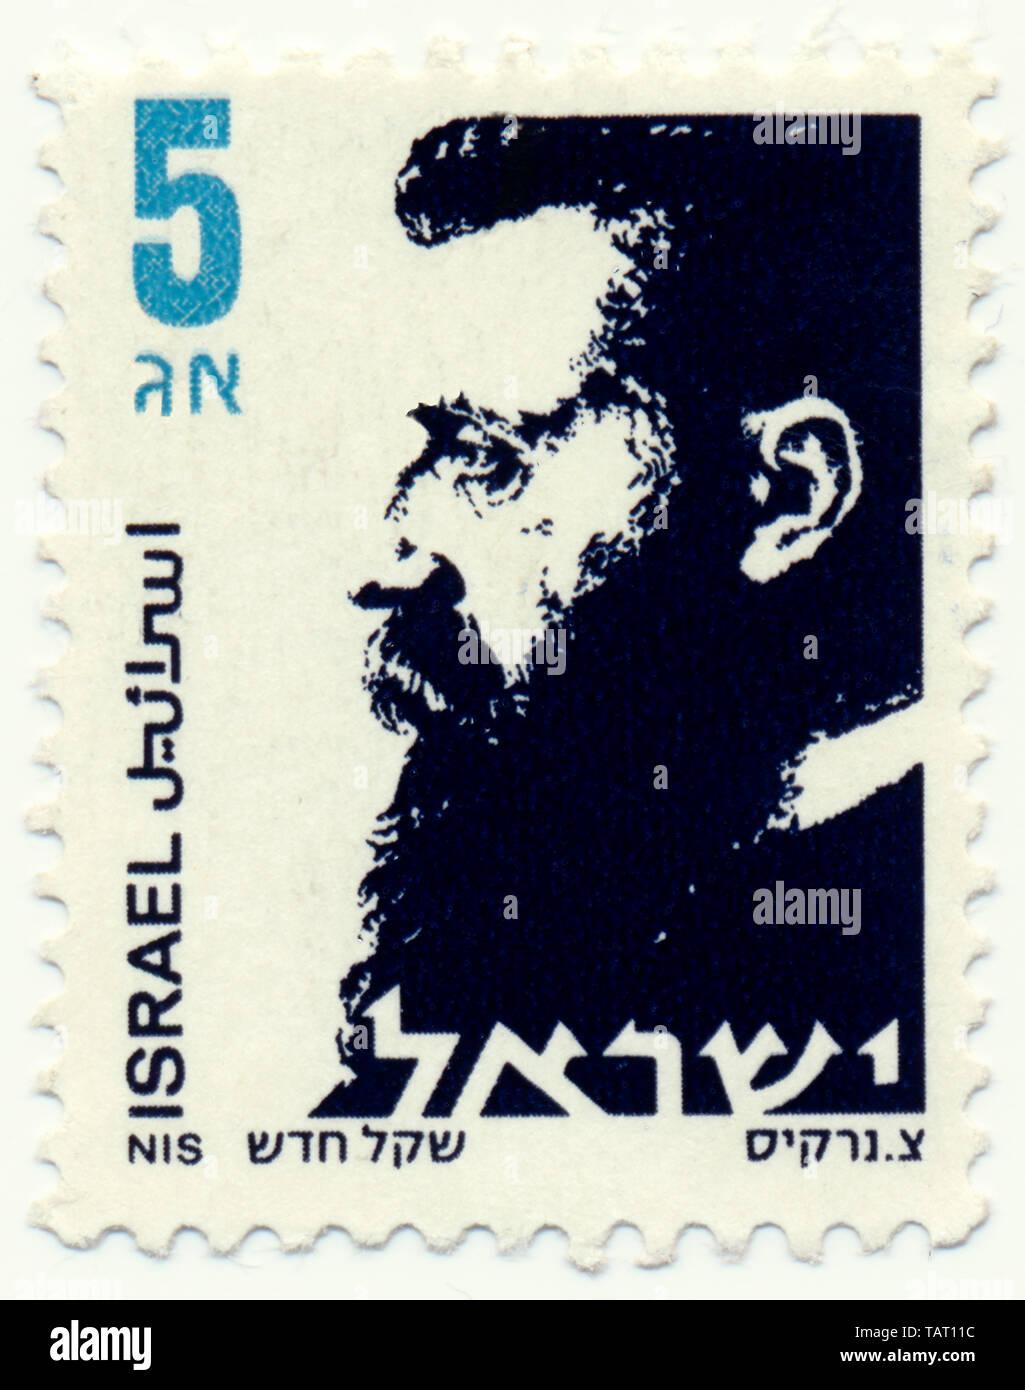 Historic postage stamps from Israel, Historische Briefmarken, Dr. Theodor Herzl, 1986, Israel, Asien Stock Photo